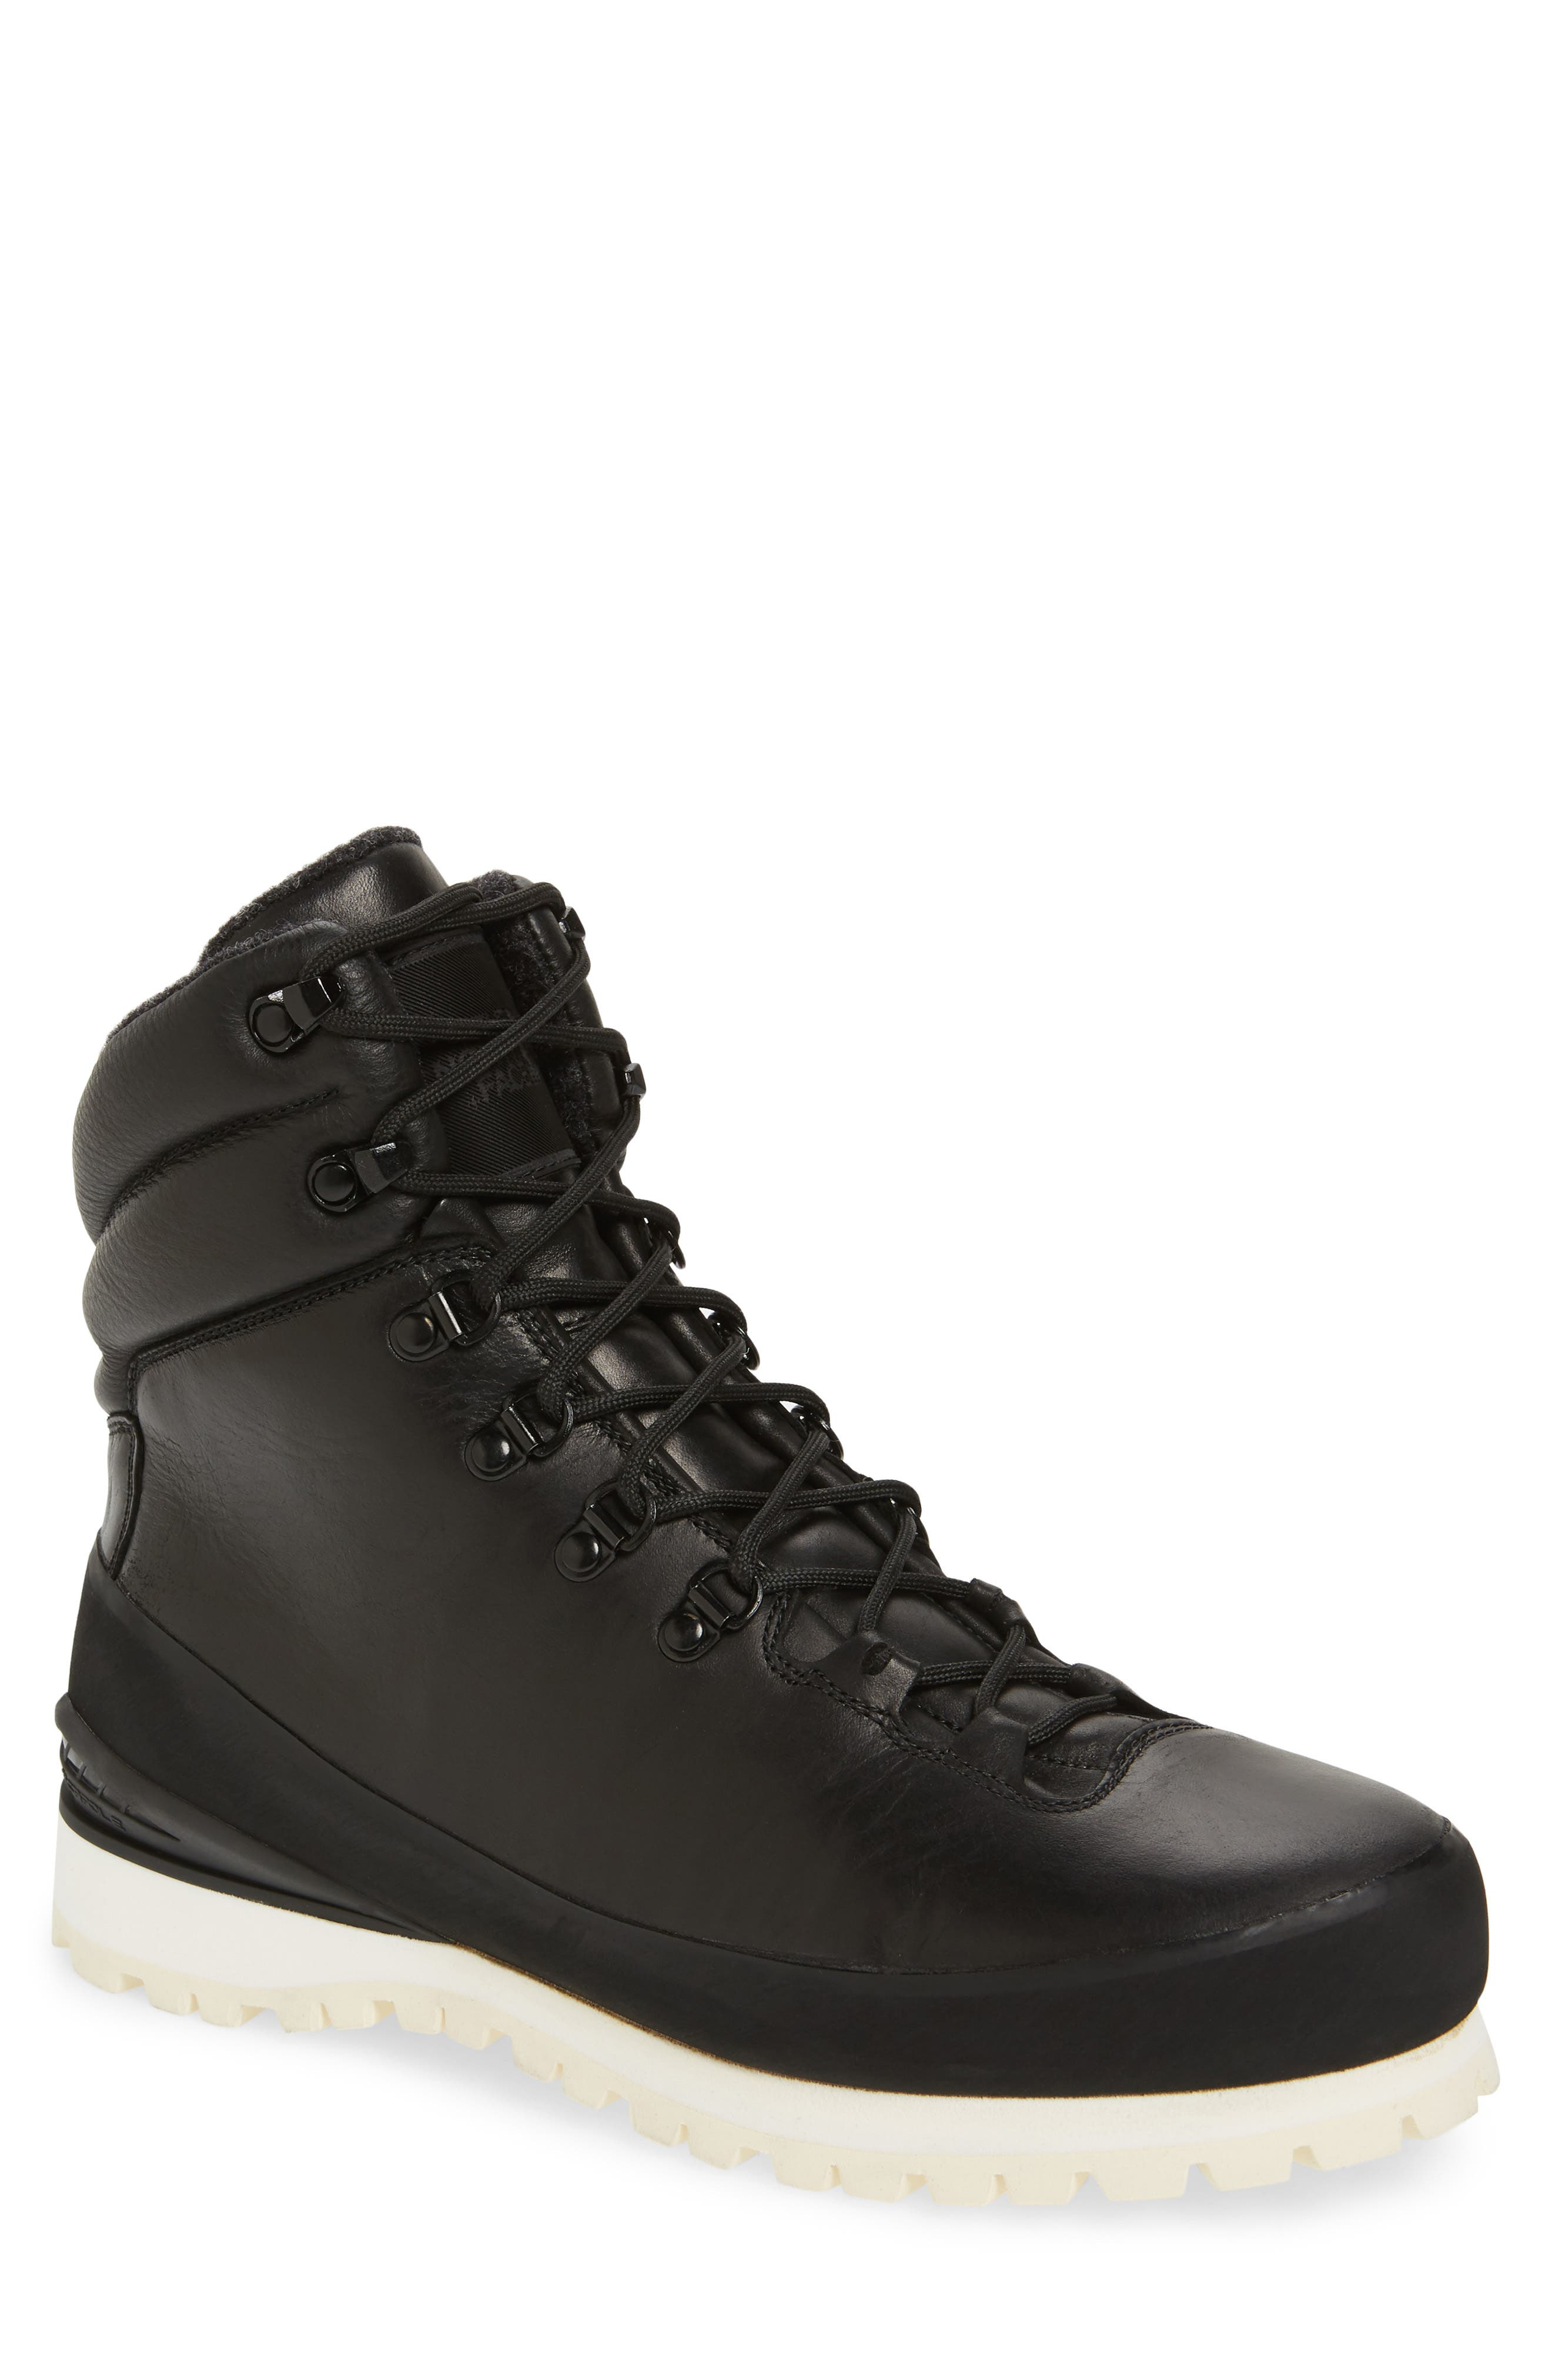 Cryos Hiker Boot,                         Main,                         color, Tnf Black/ Tnf White